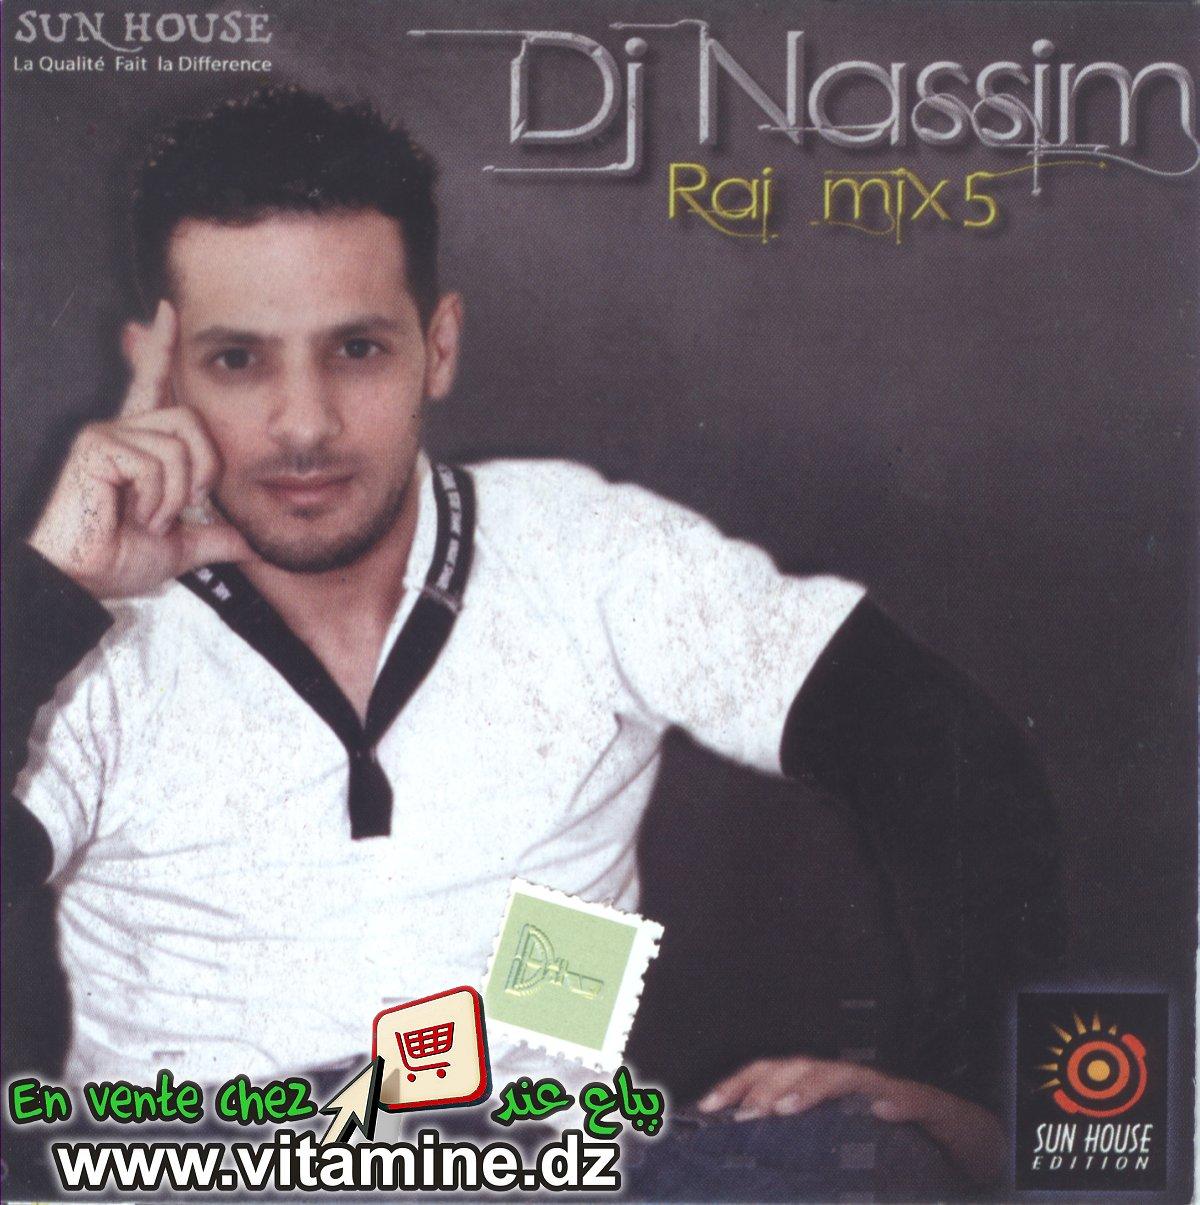 Dj Nassim - Rai mix 5